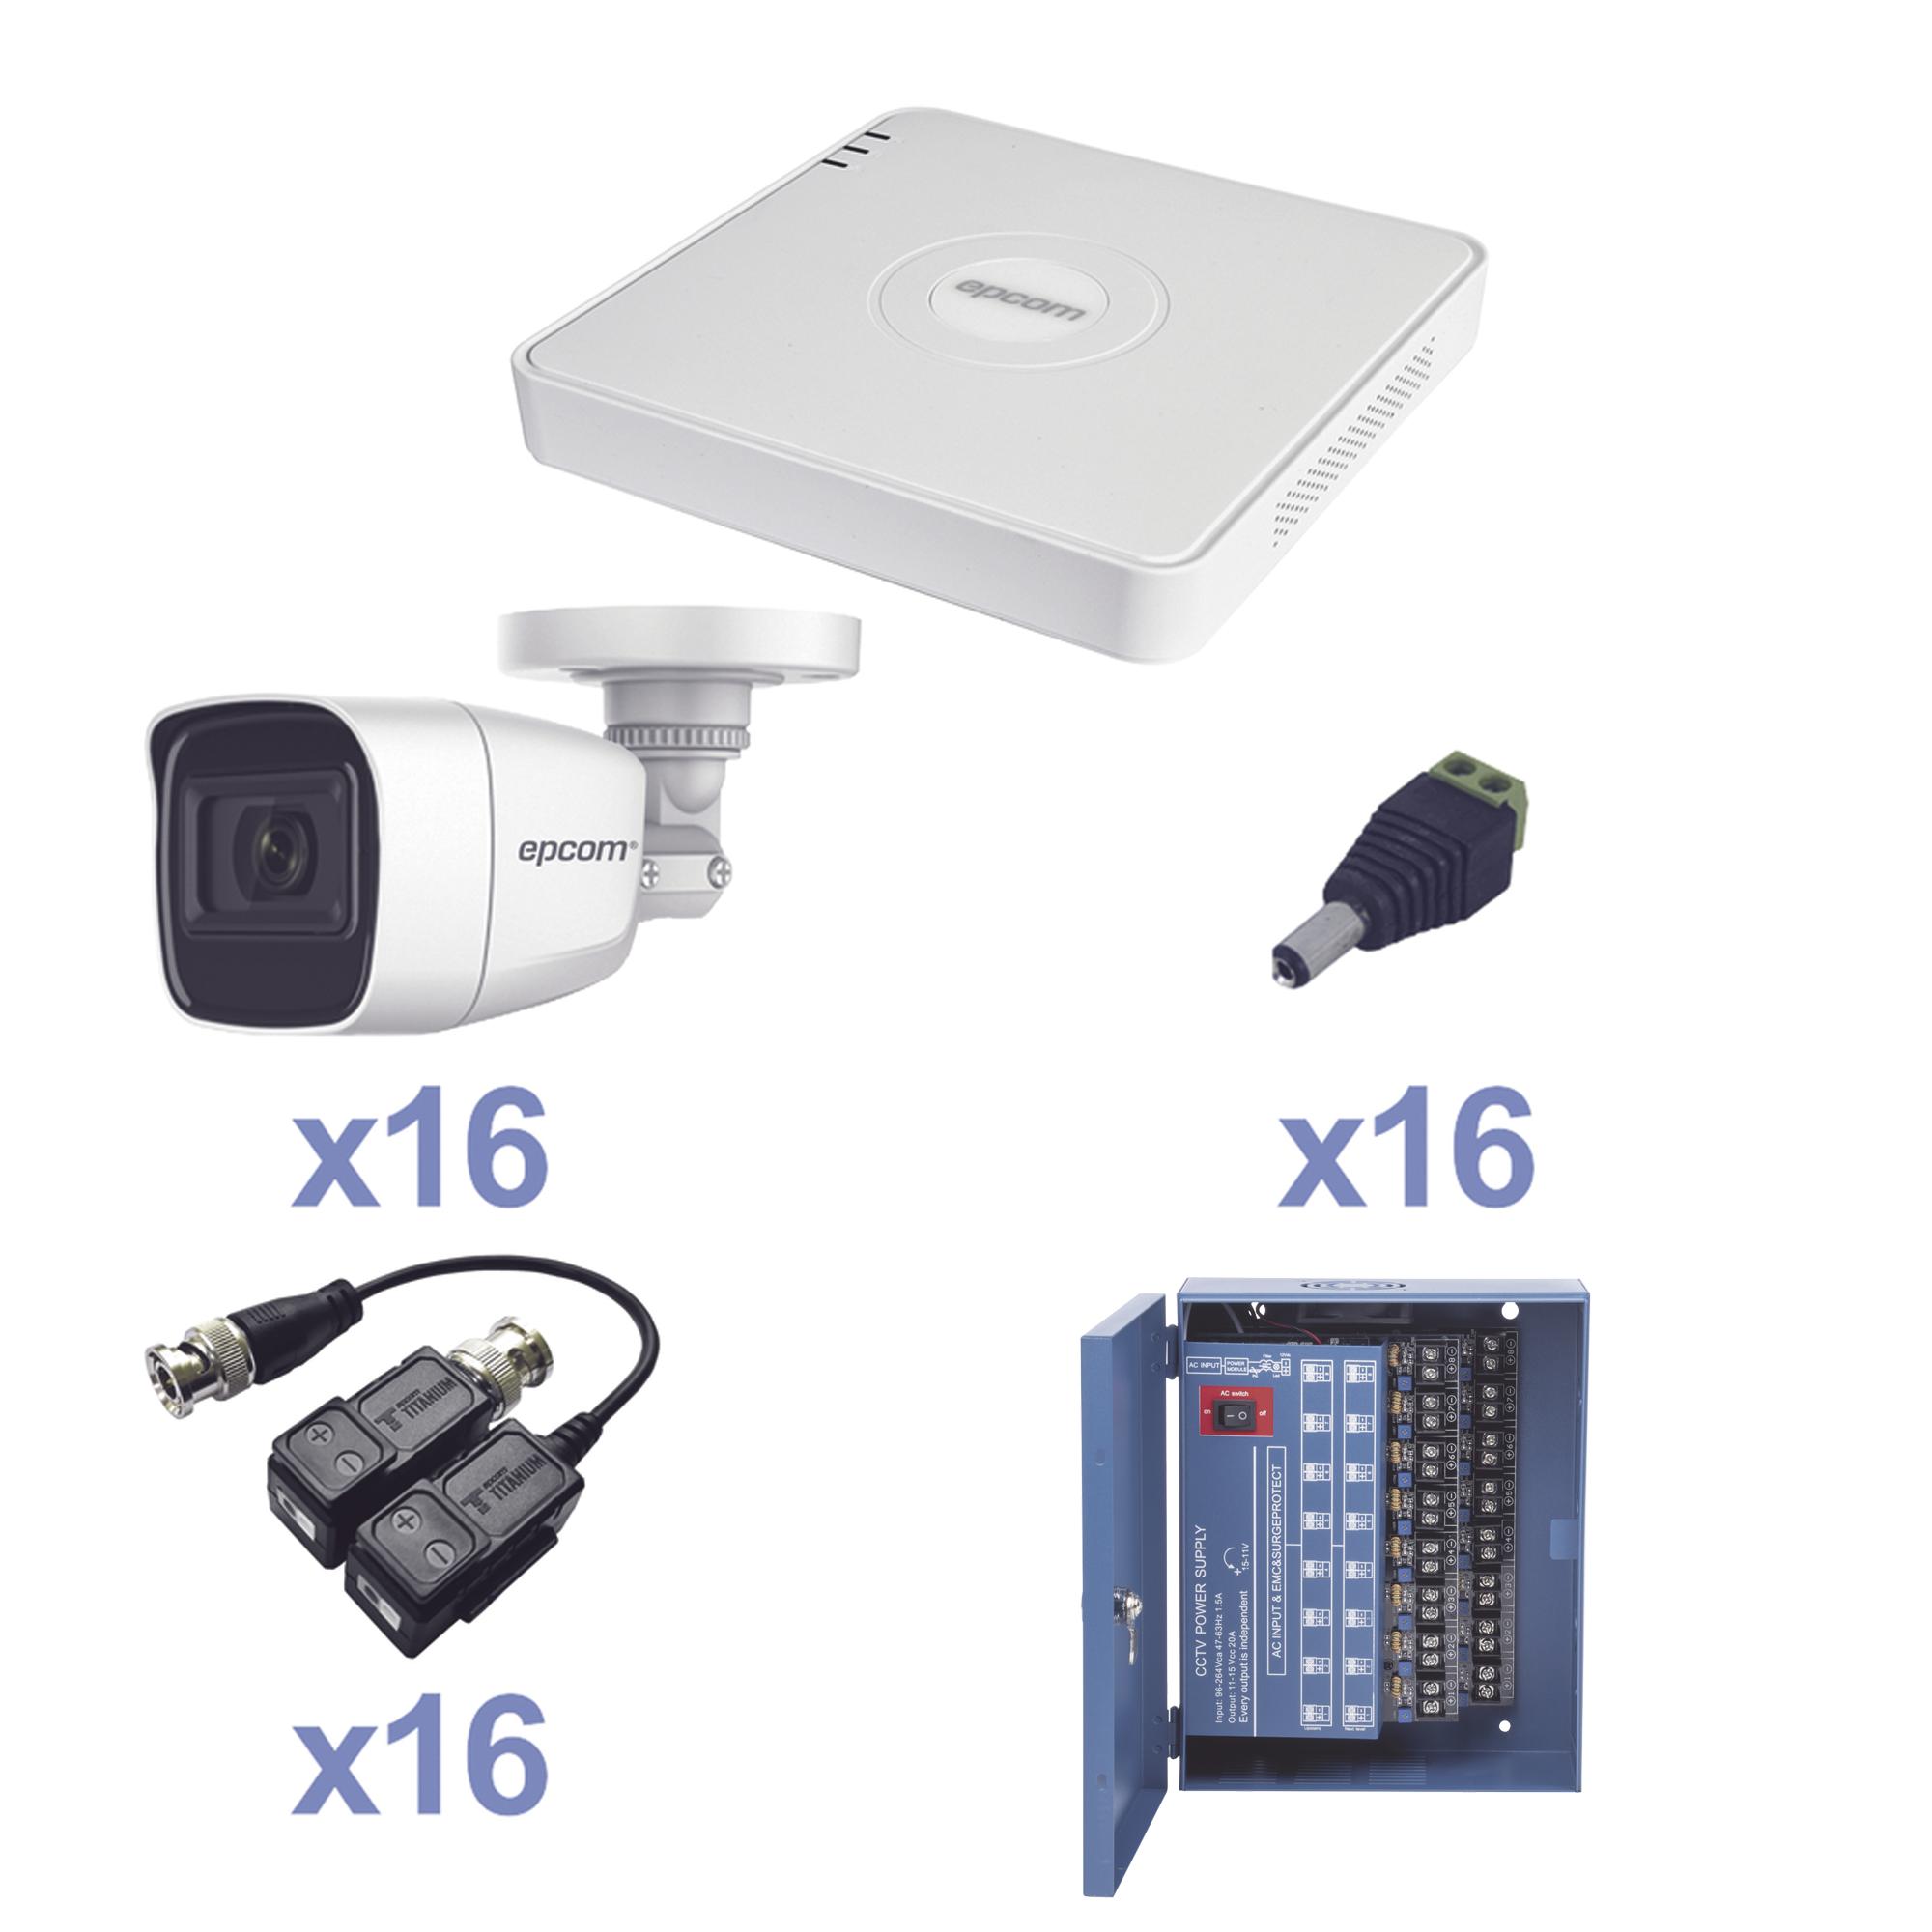 KIT TurboHD 720p / Incluye DVR 16 Ch / 16 cámaras balas (interior - exterior 3.6 mm) / Transceptores / Conectores / Fuente de poder profesional Heavy Duty 20A, Hasta 15Vcd para Larga Distancia